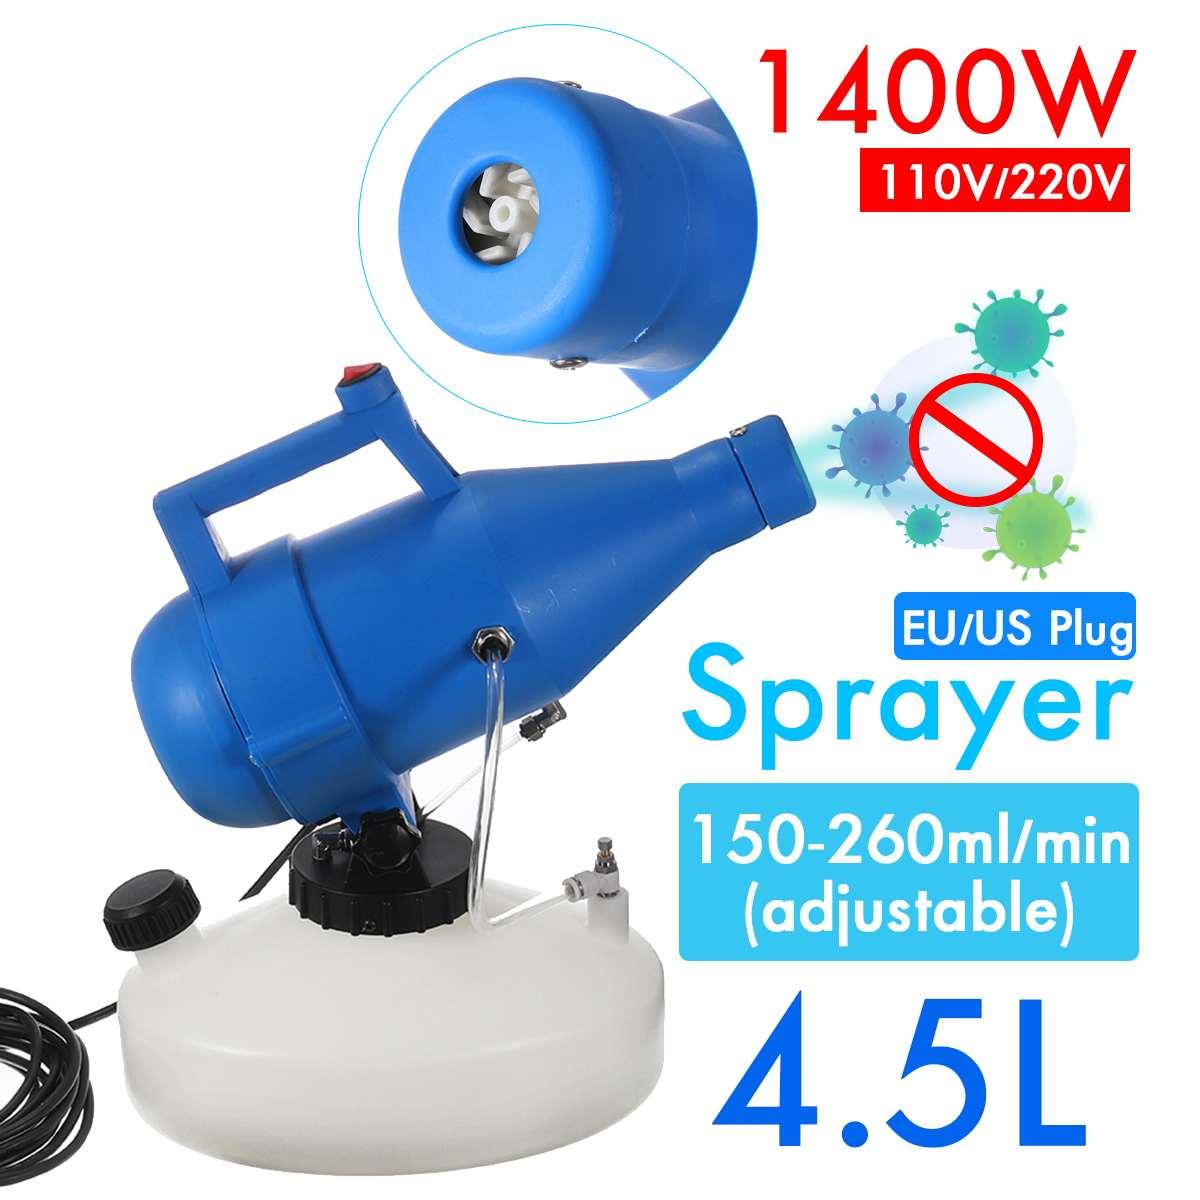 110V/220V 4.5L 1400W Portable Electric ULV Fogger Machine Sprayer Hotels Disinfection Home Sterilizat Residence Office Industr